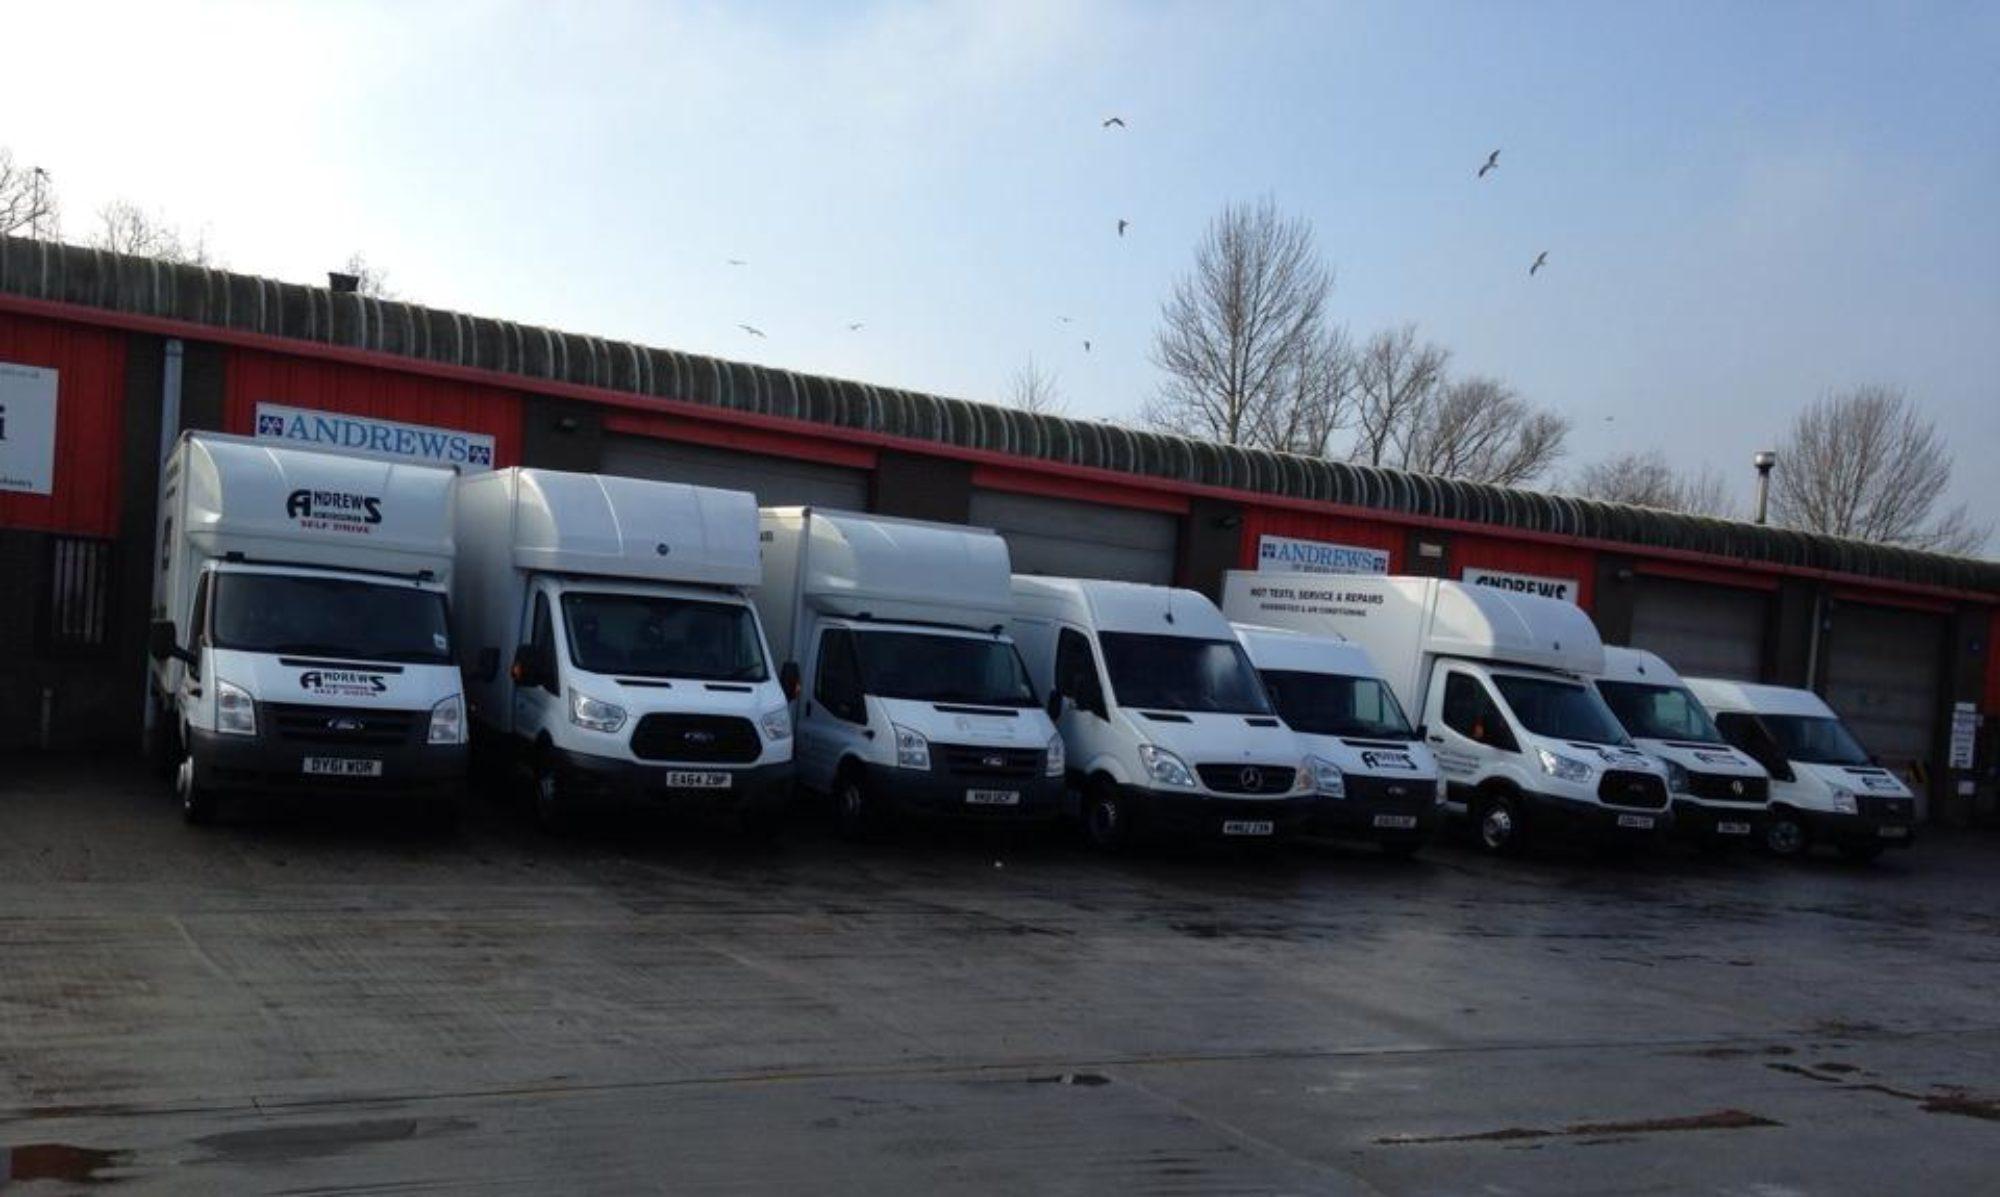 Andrews Self Drive, Beverley, Hull